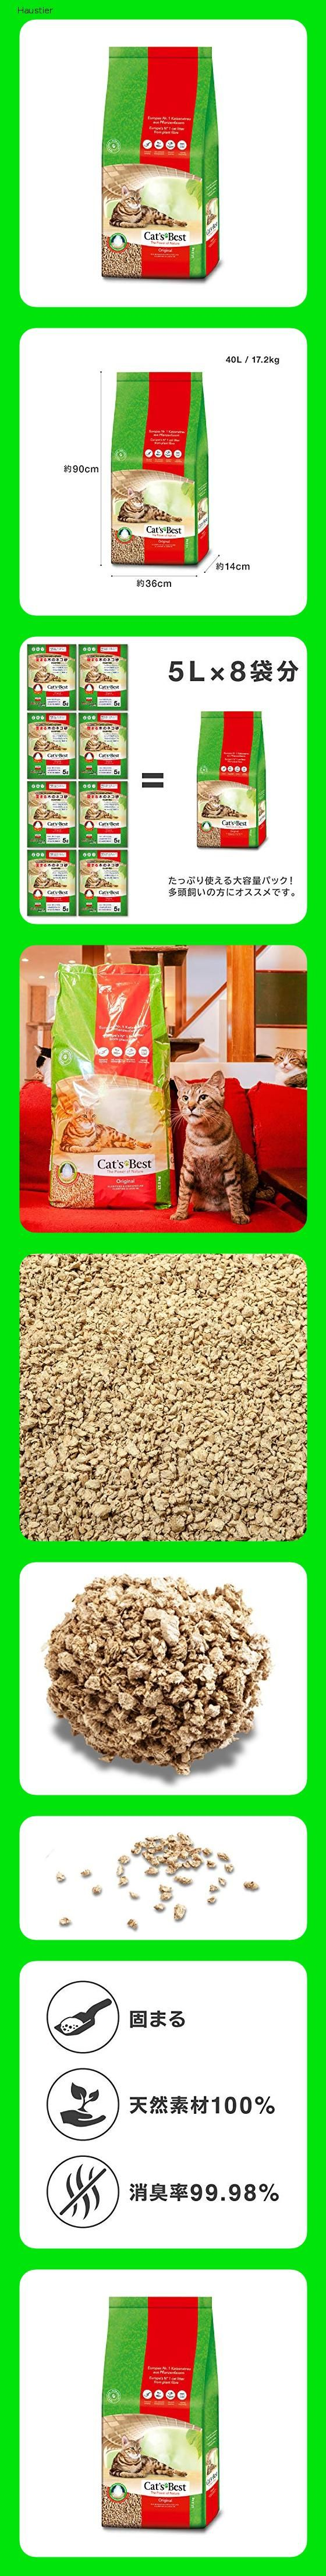 Cat S Best Original Katzenstreu 40 Liter 147o In 2020 Cats Best Haustiere Katzen